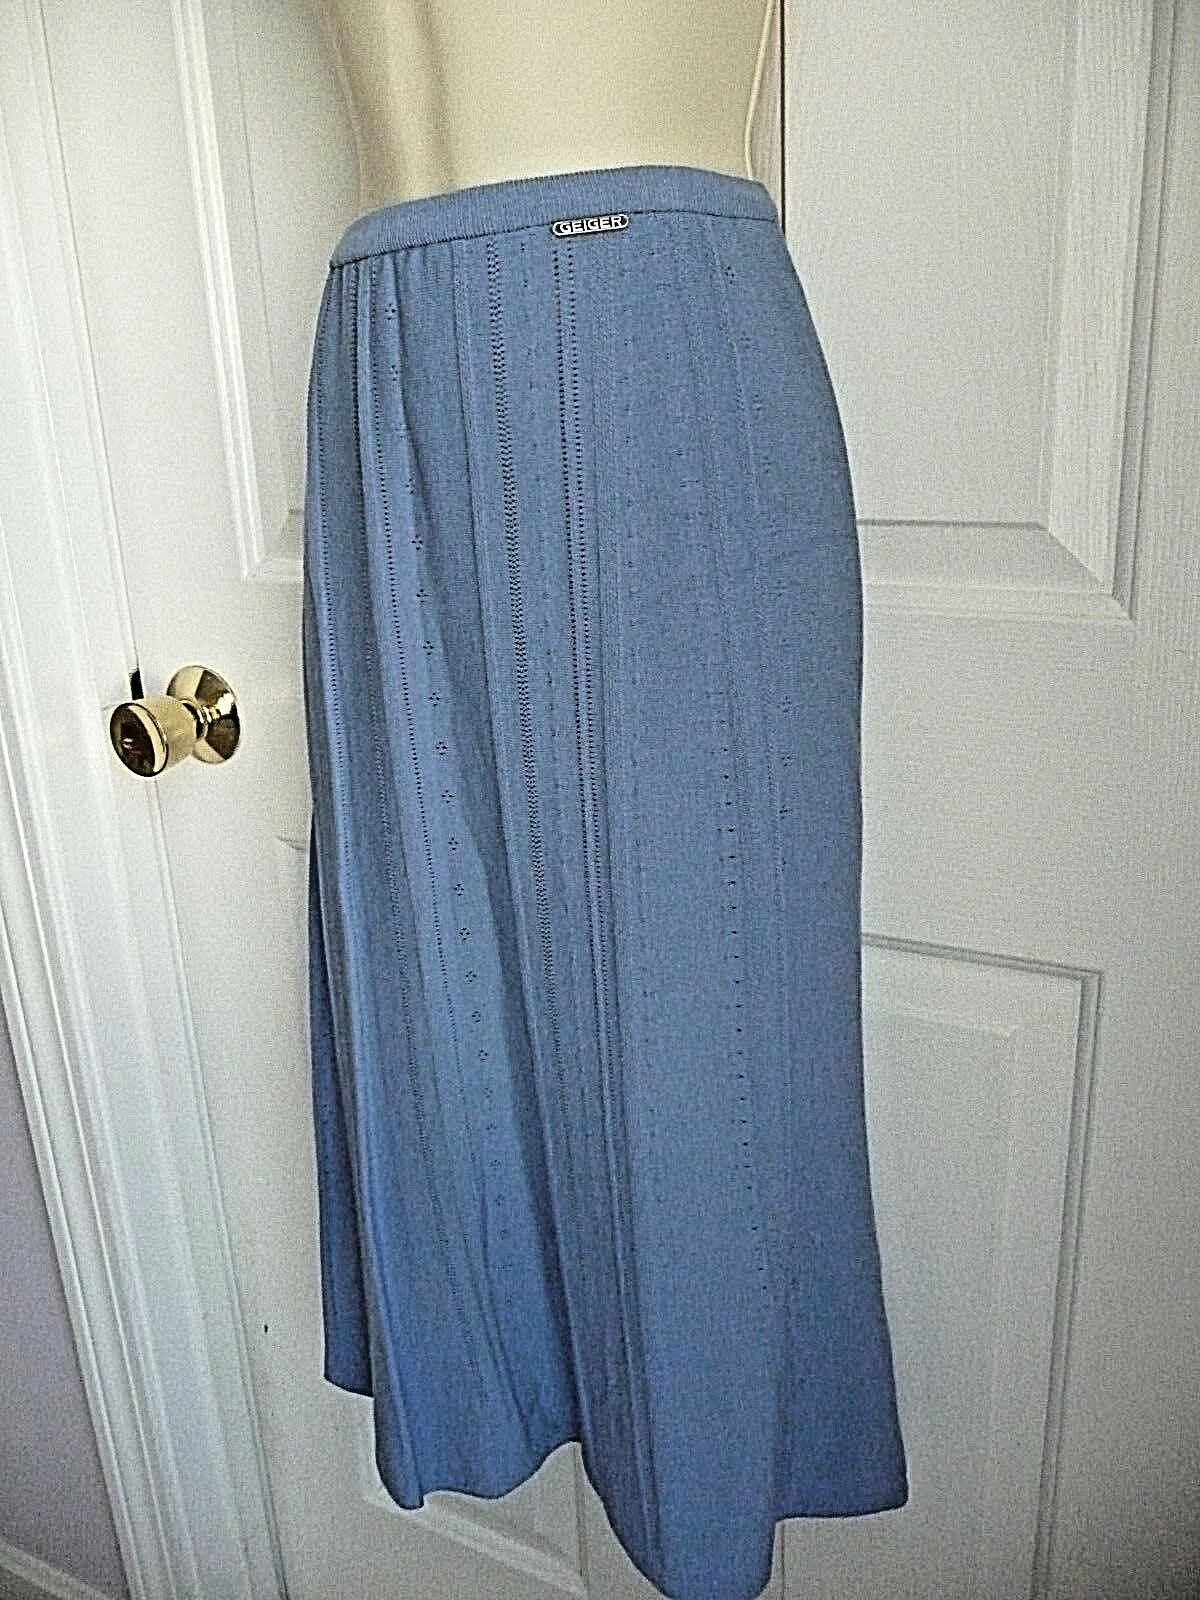 GEIGER Australia Skirt NWT 42 L  Periwinkle bluee Knit A-Line Viscose WoW